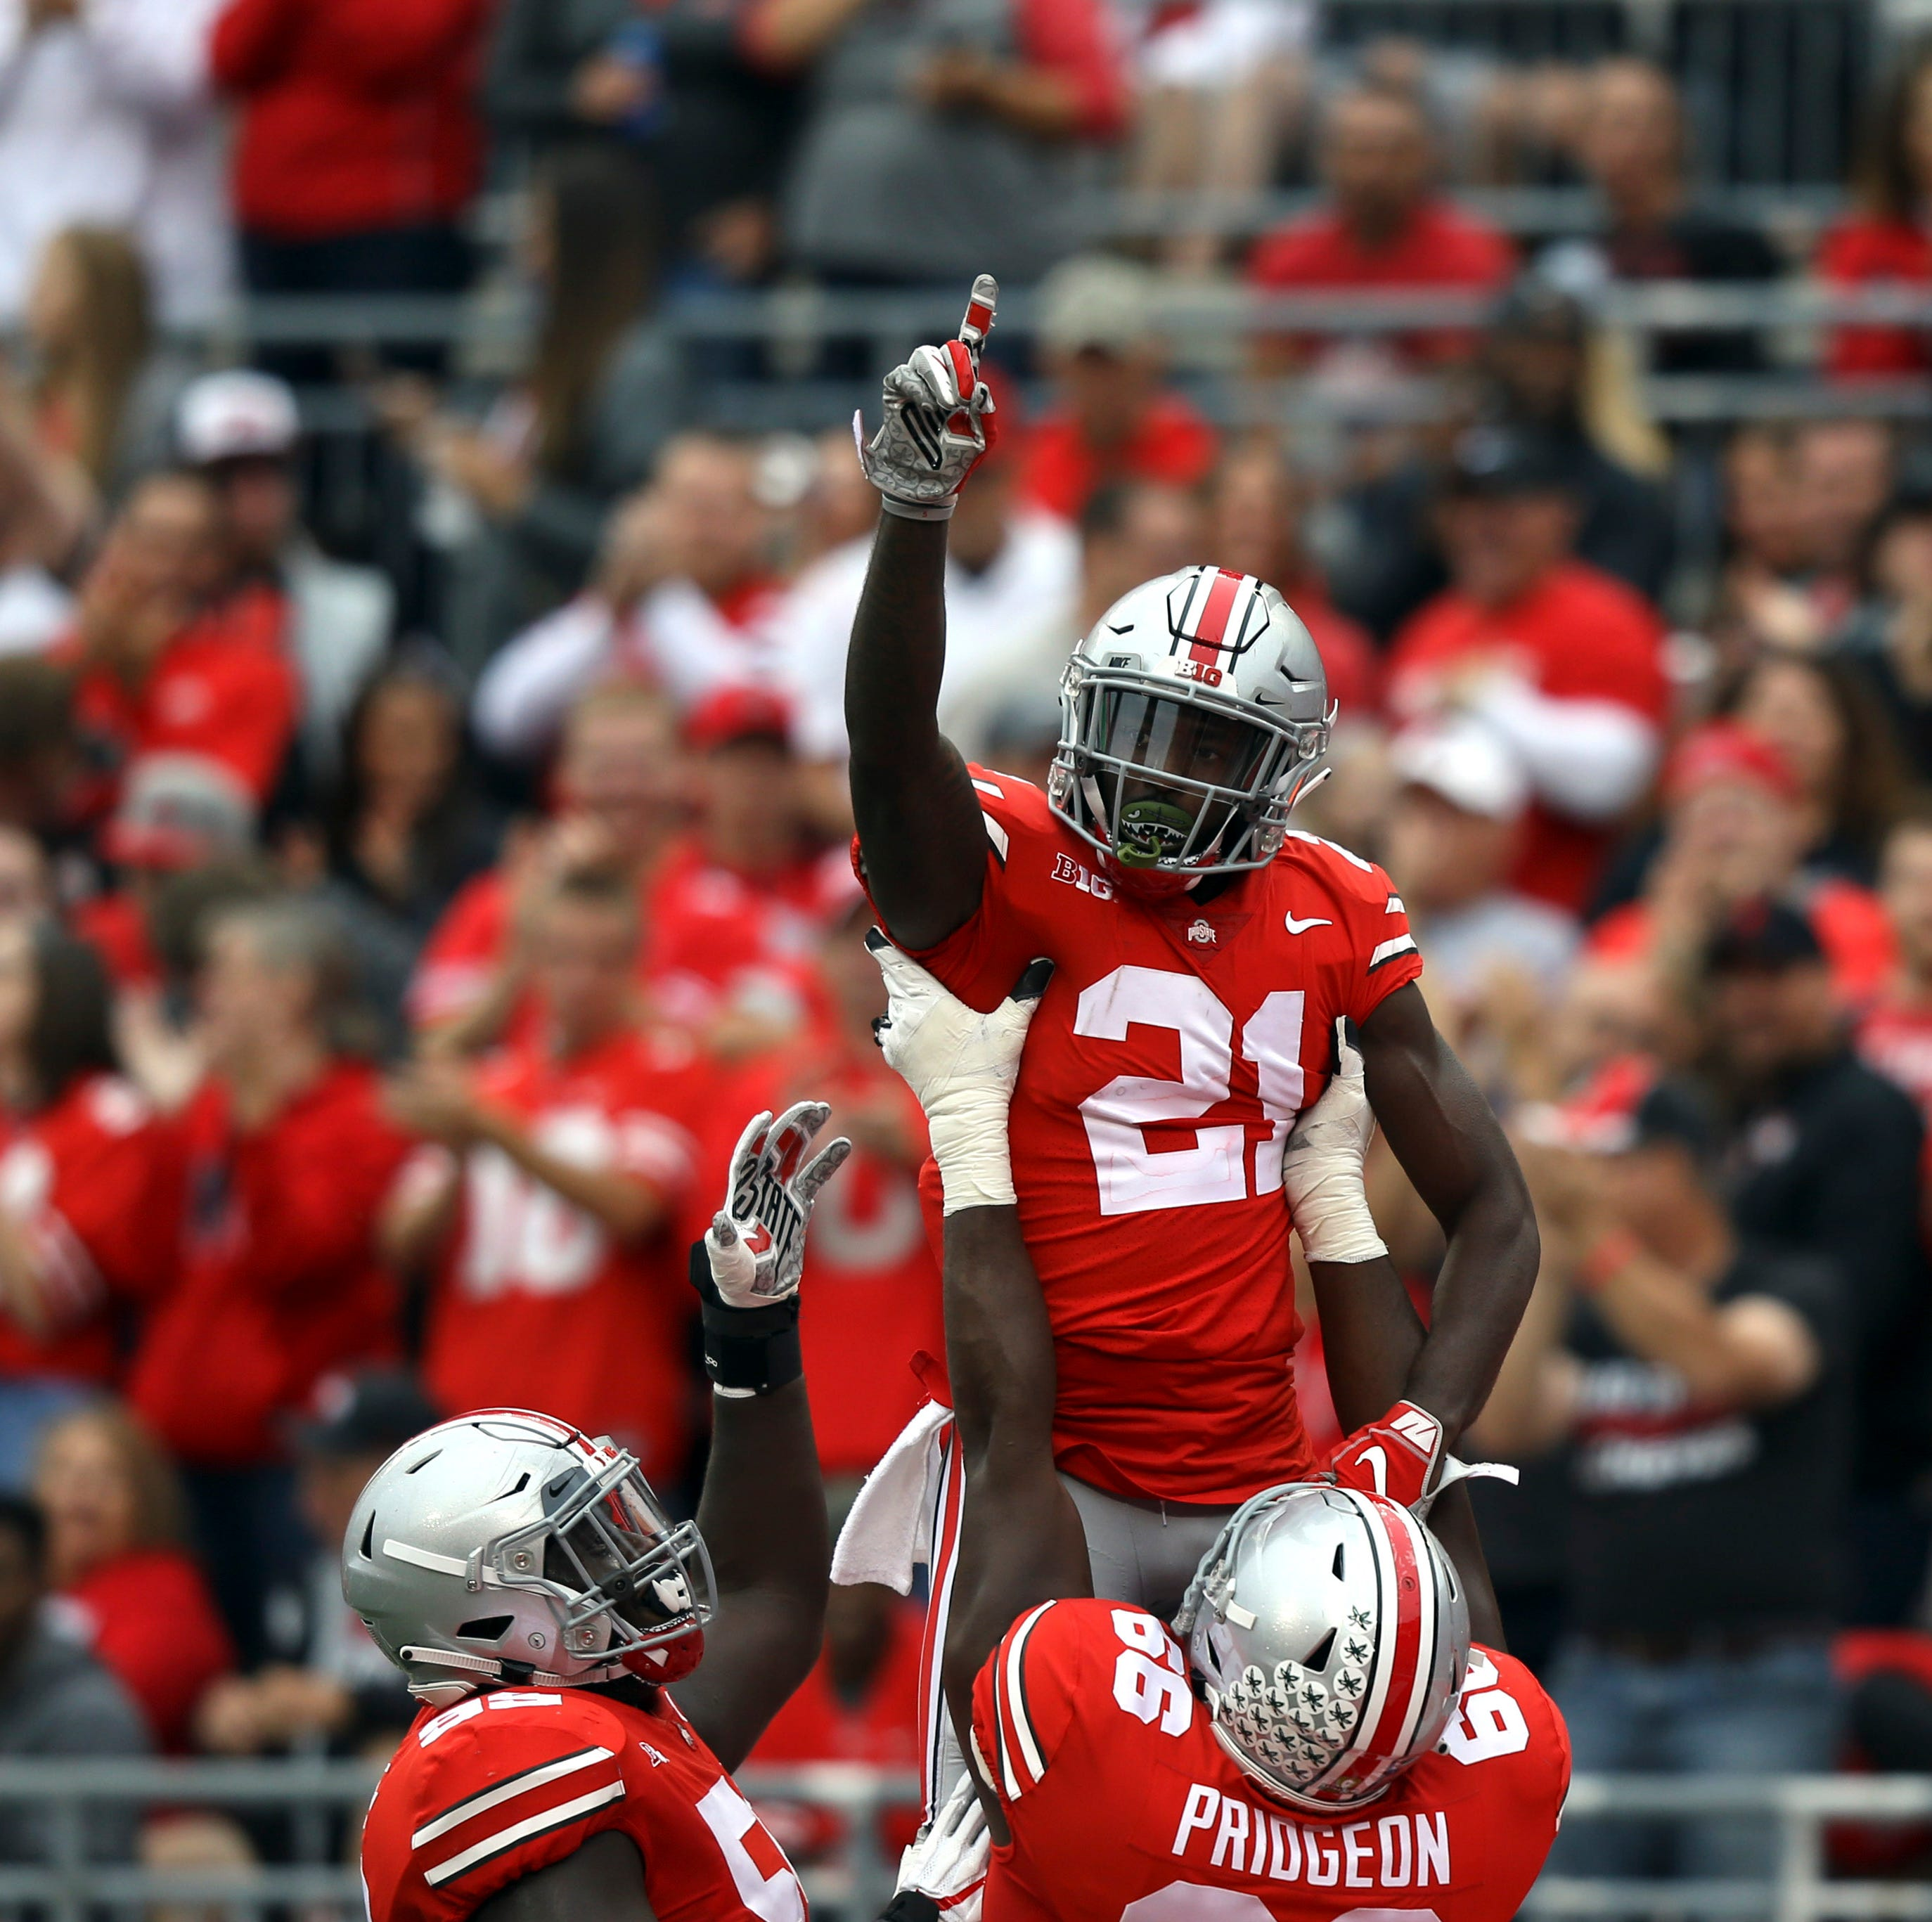 Bring on Penn State: OSU report card